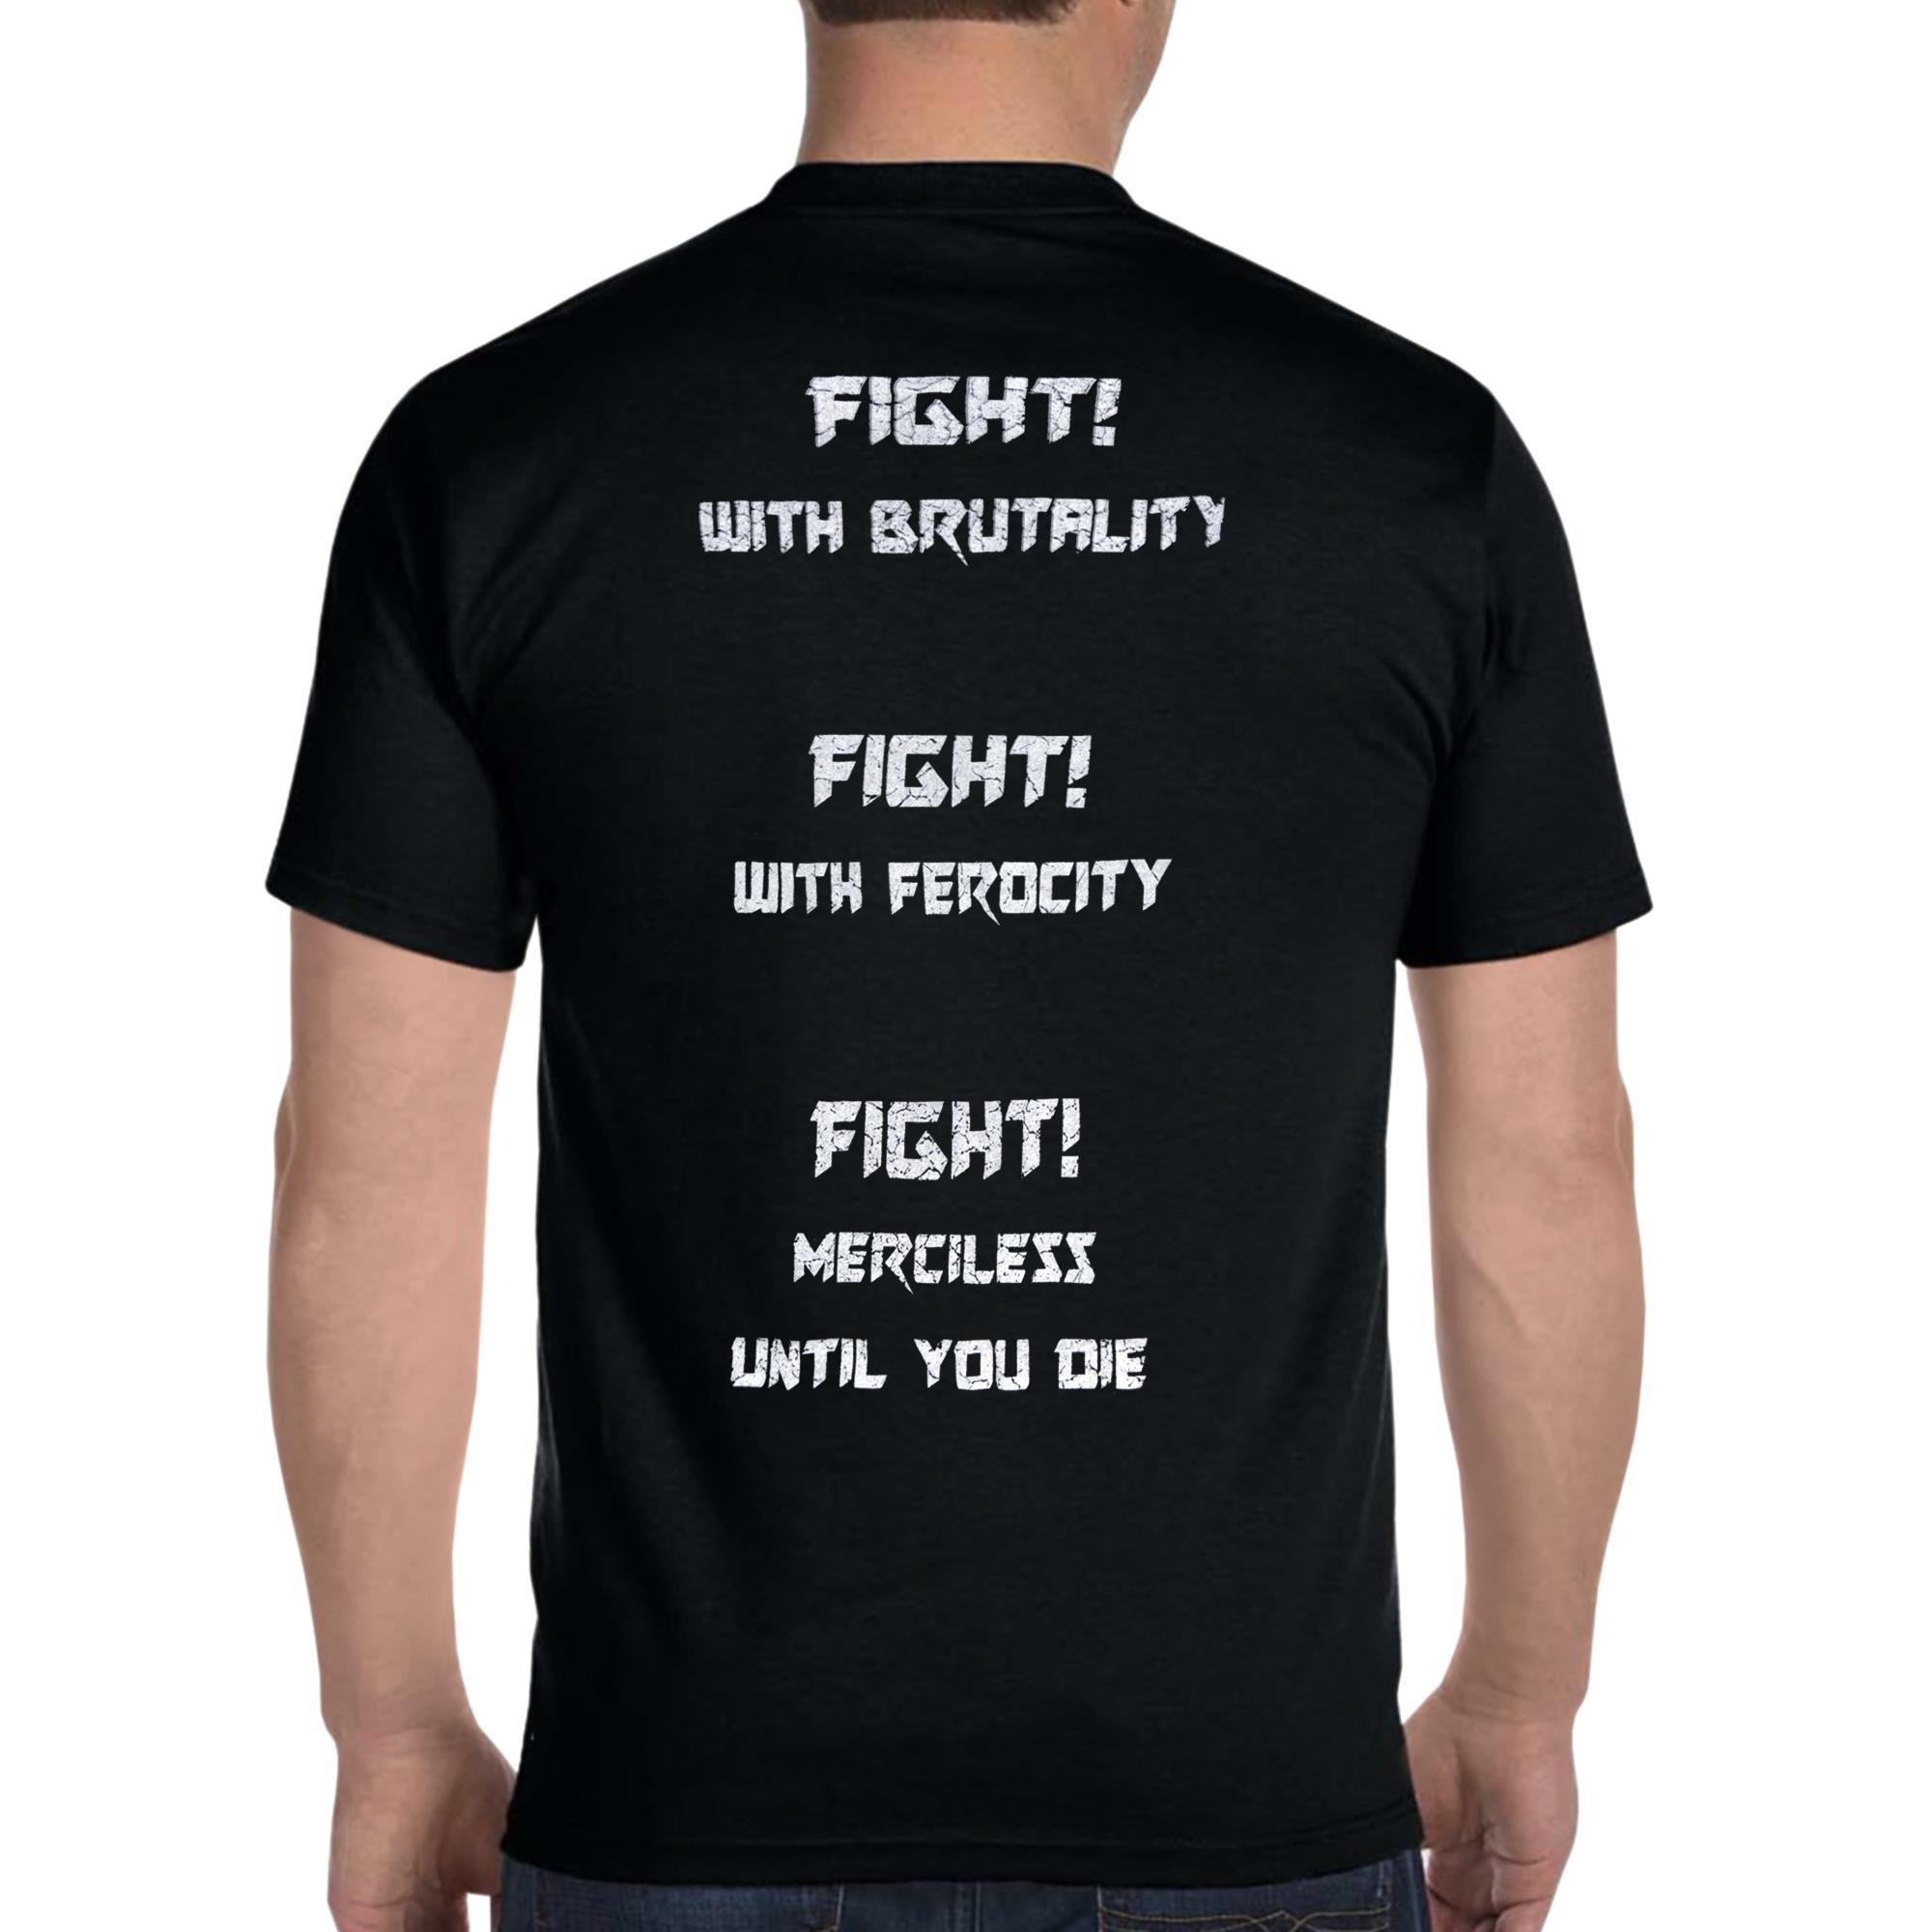 Eradicate T-shirt